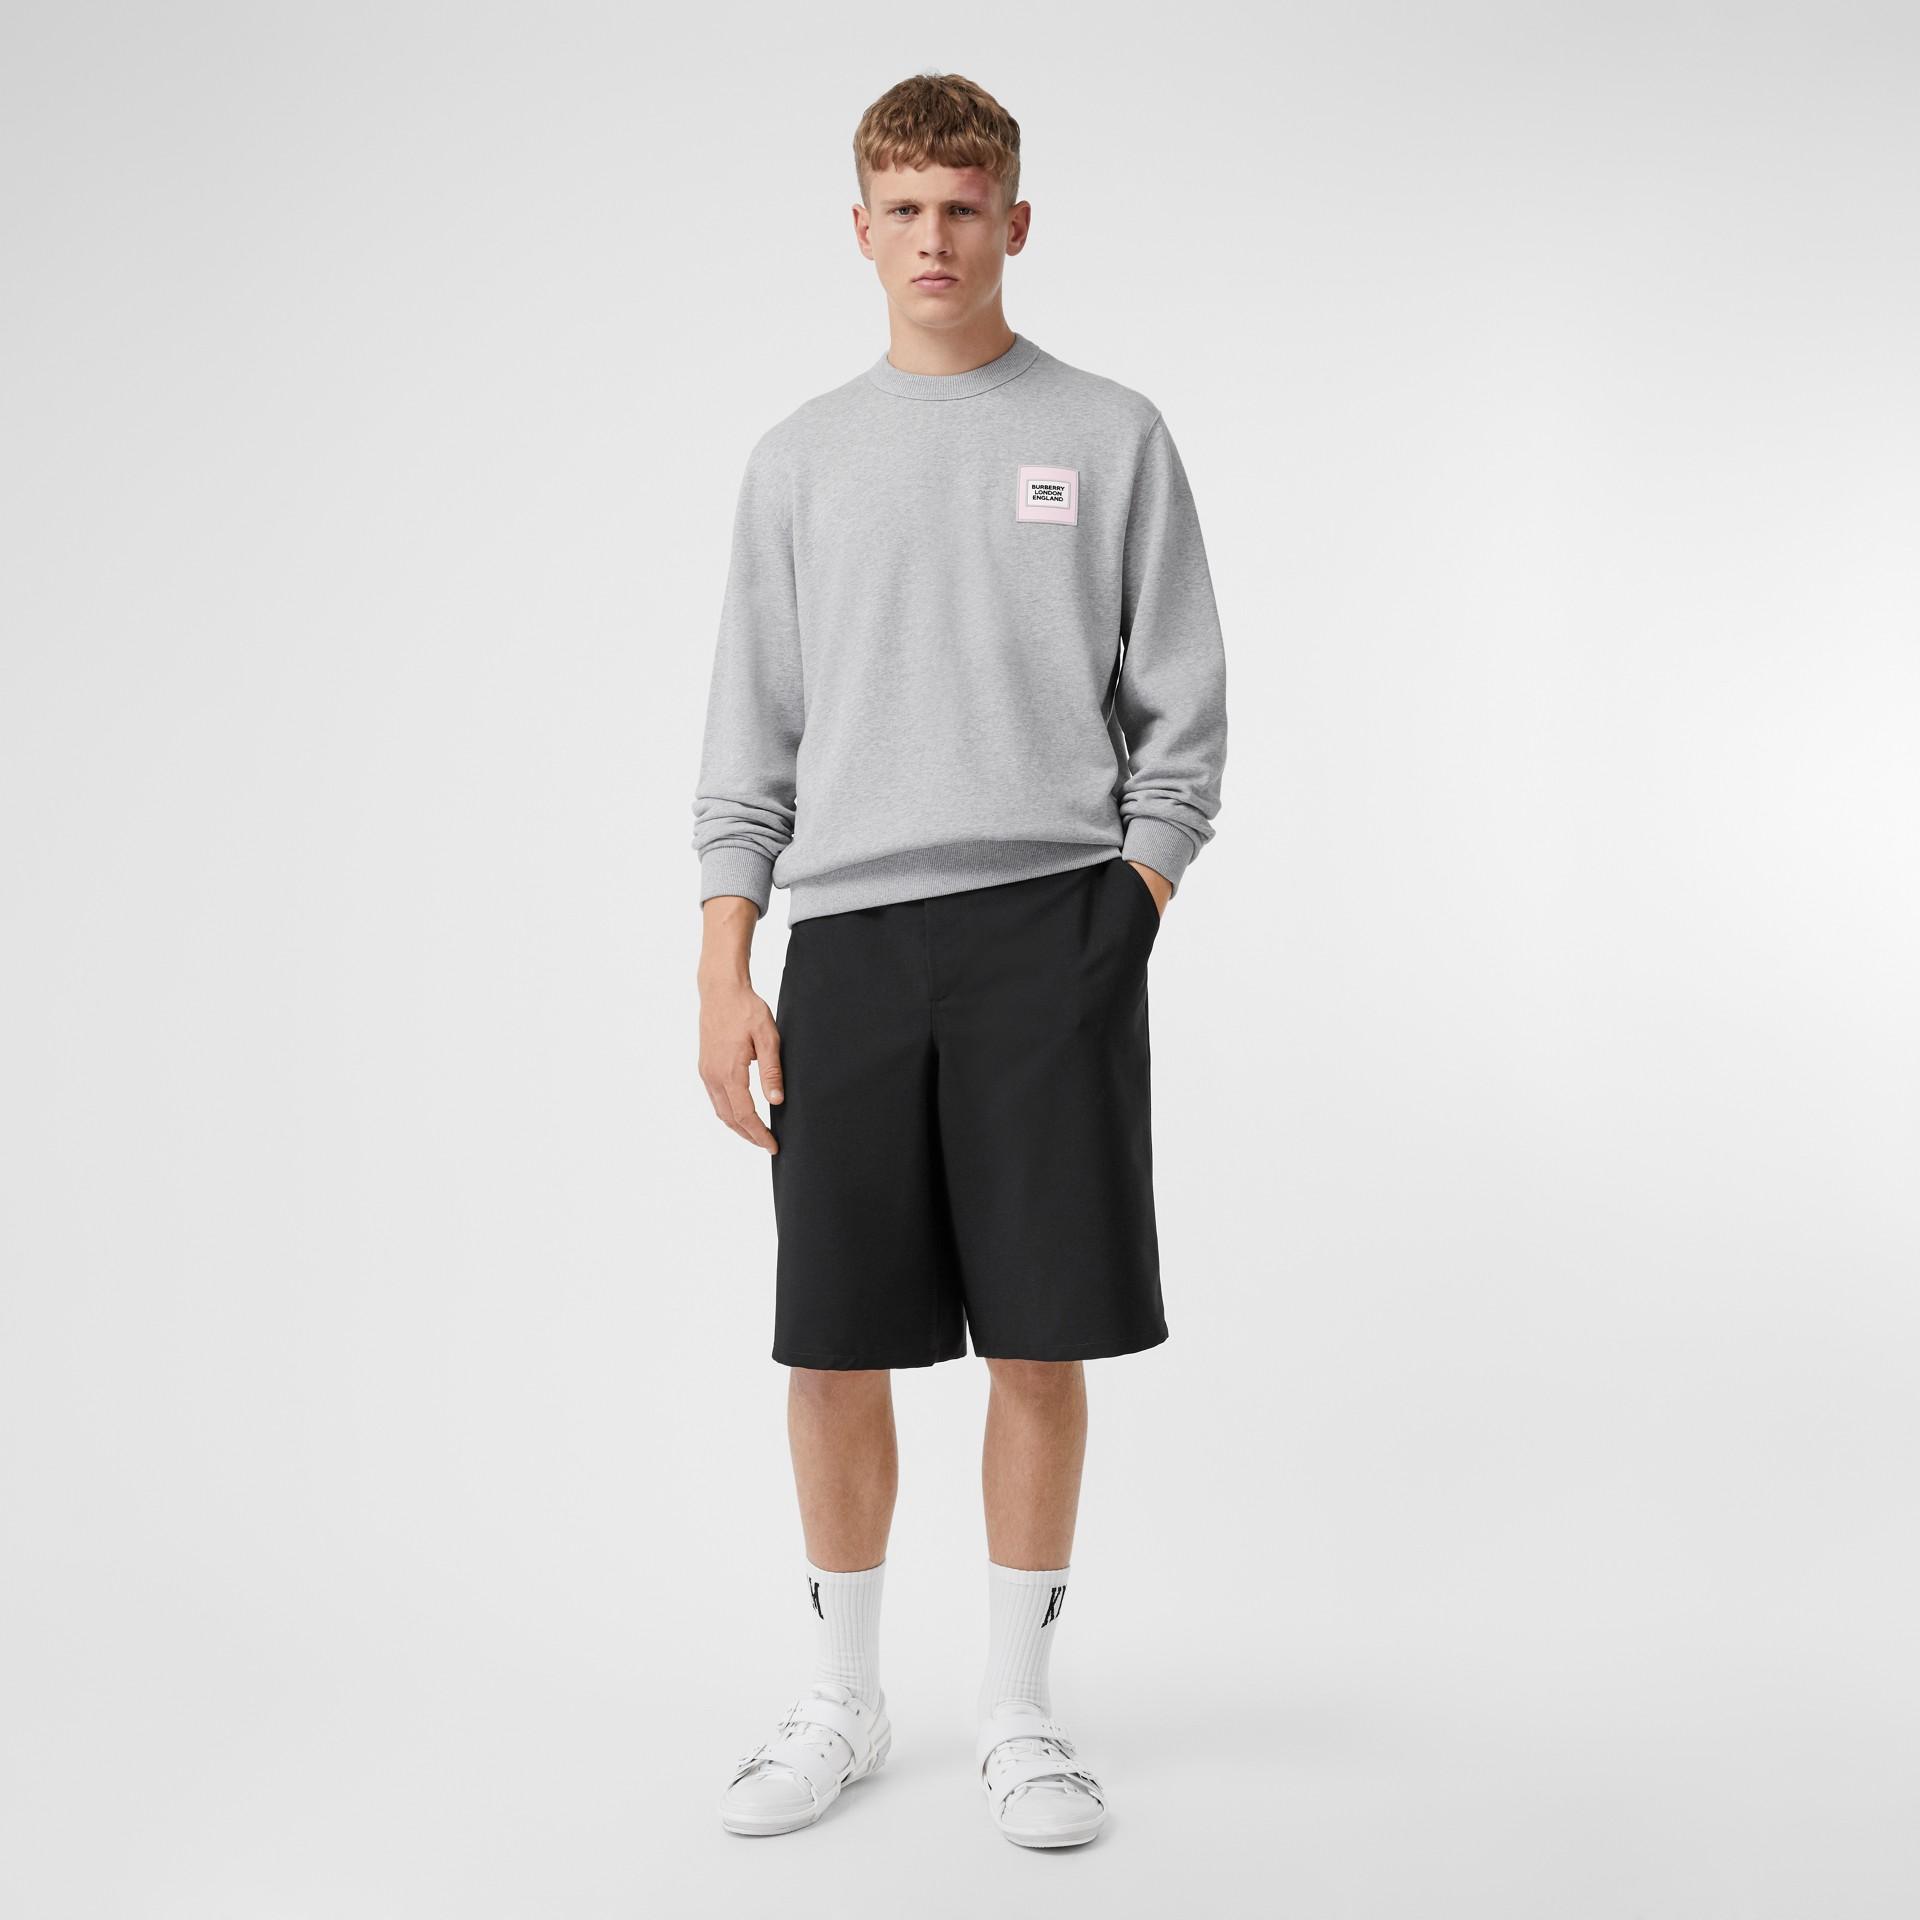 Logo Appliqué Cotton Sweatshirt in Pale Grey Melange - Men | Burberry United Kingdom - gallery image 4